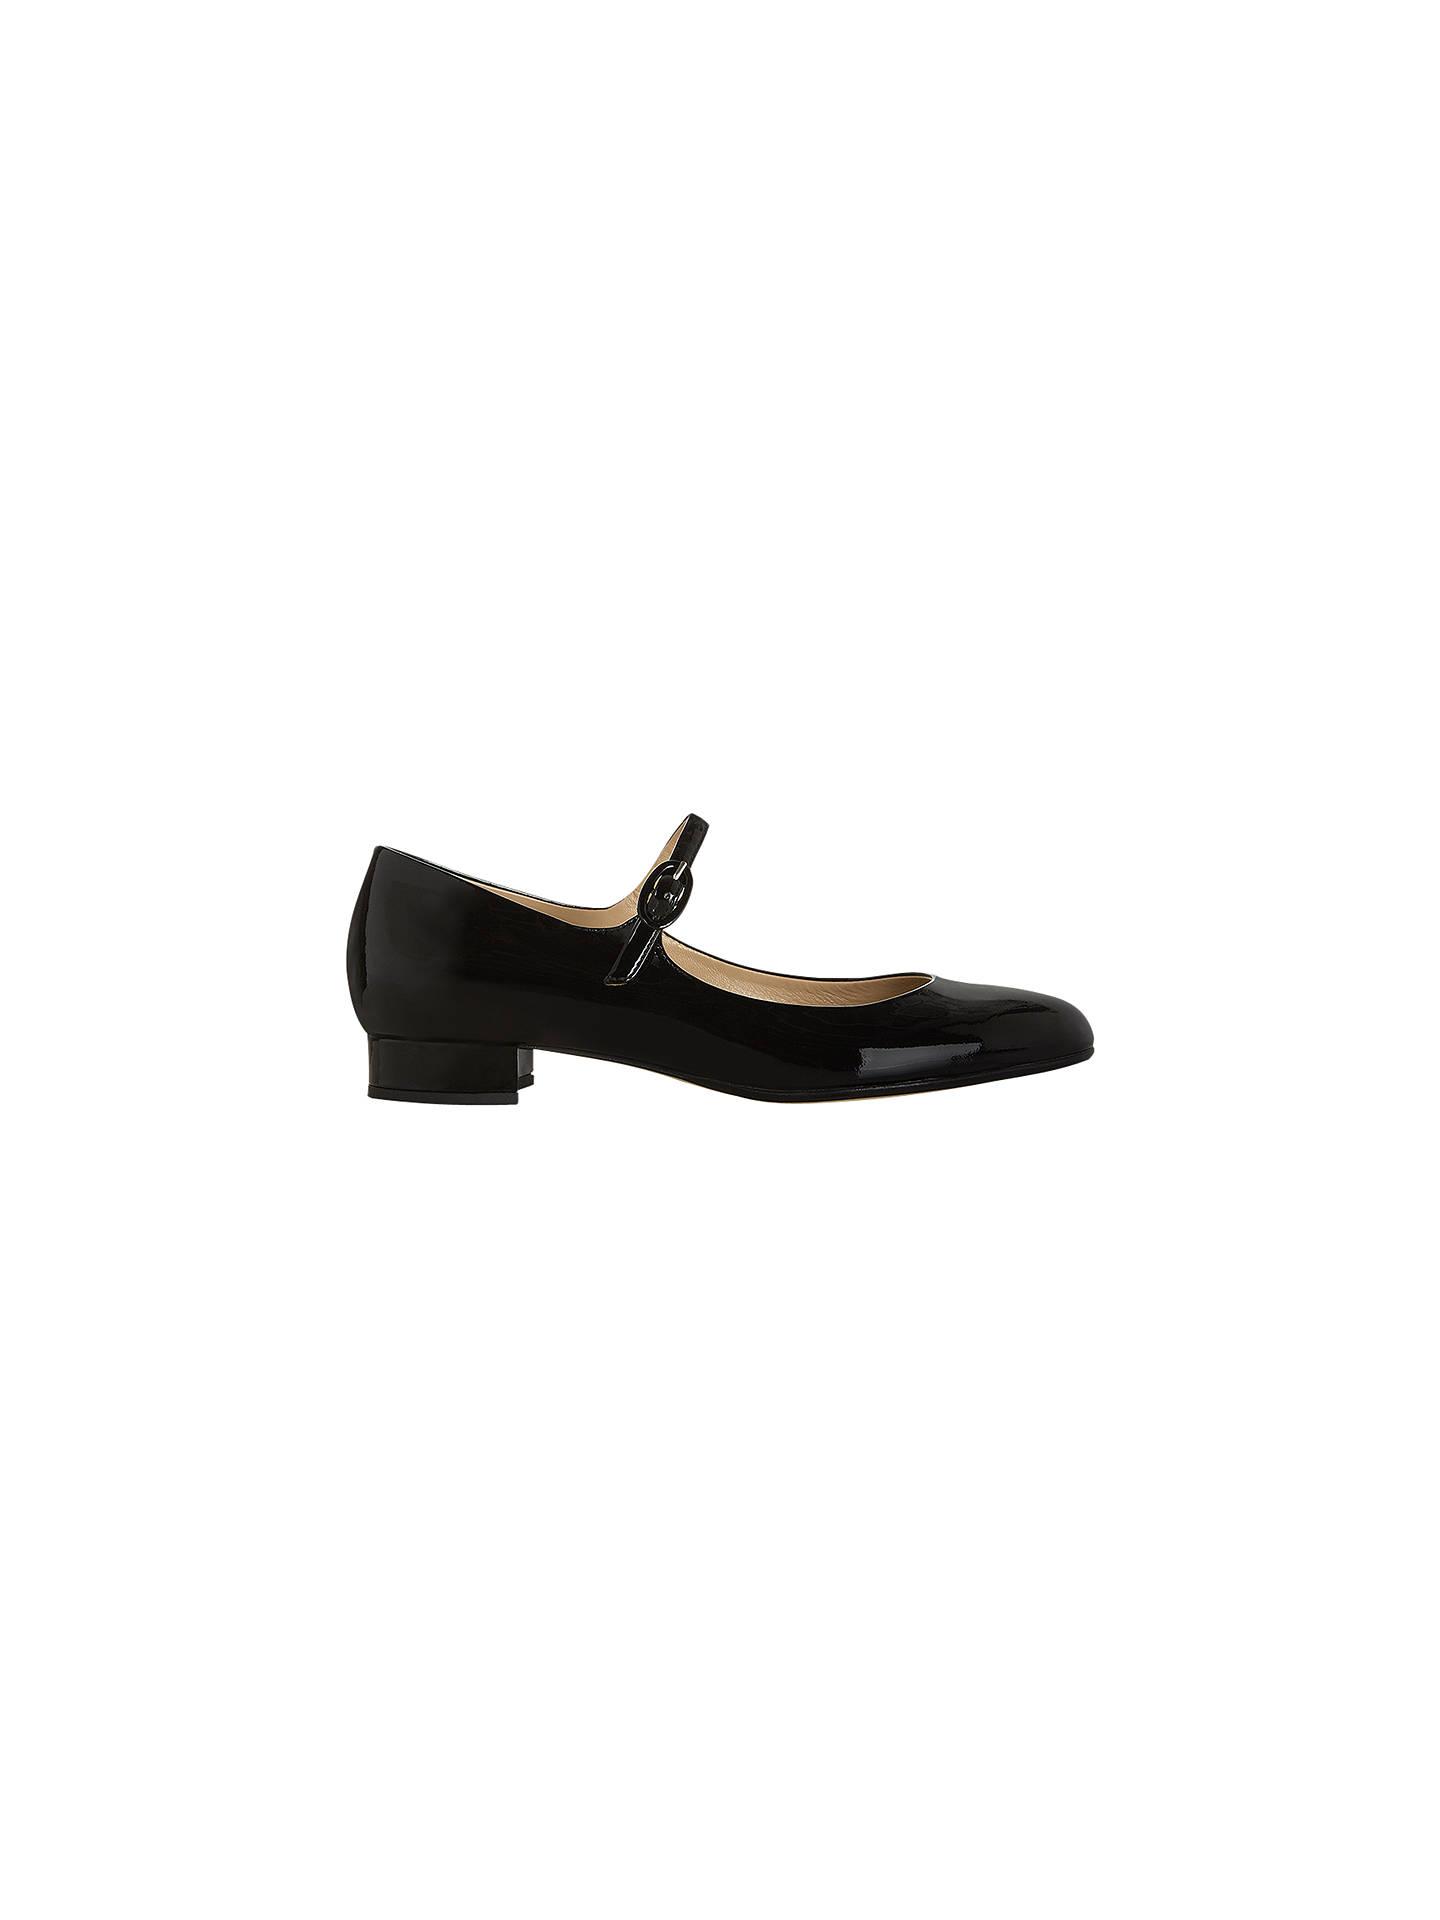 e113fa1c666dc Hobbs Tess Patent Mary-Jane Shoes, Black at John Lewis & Partners